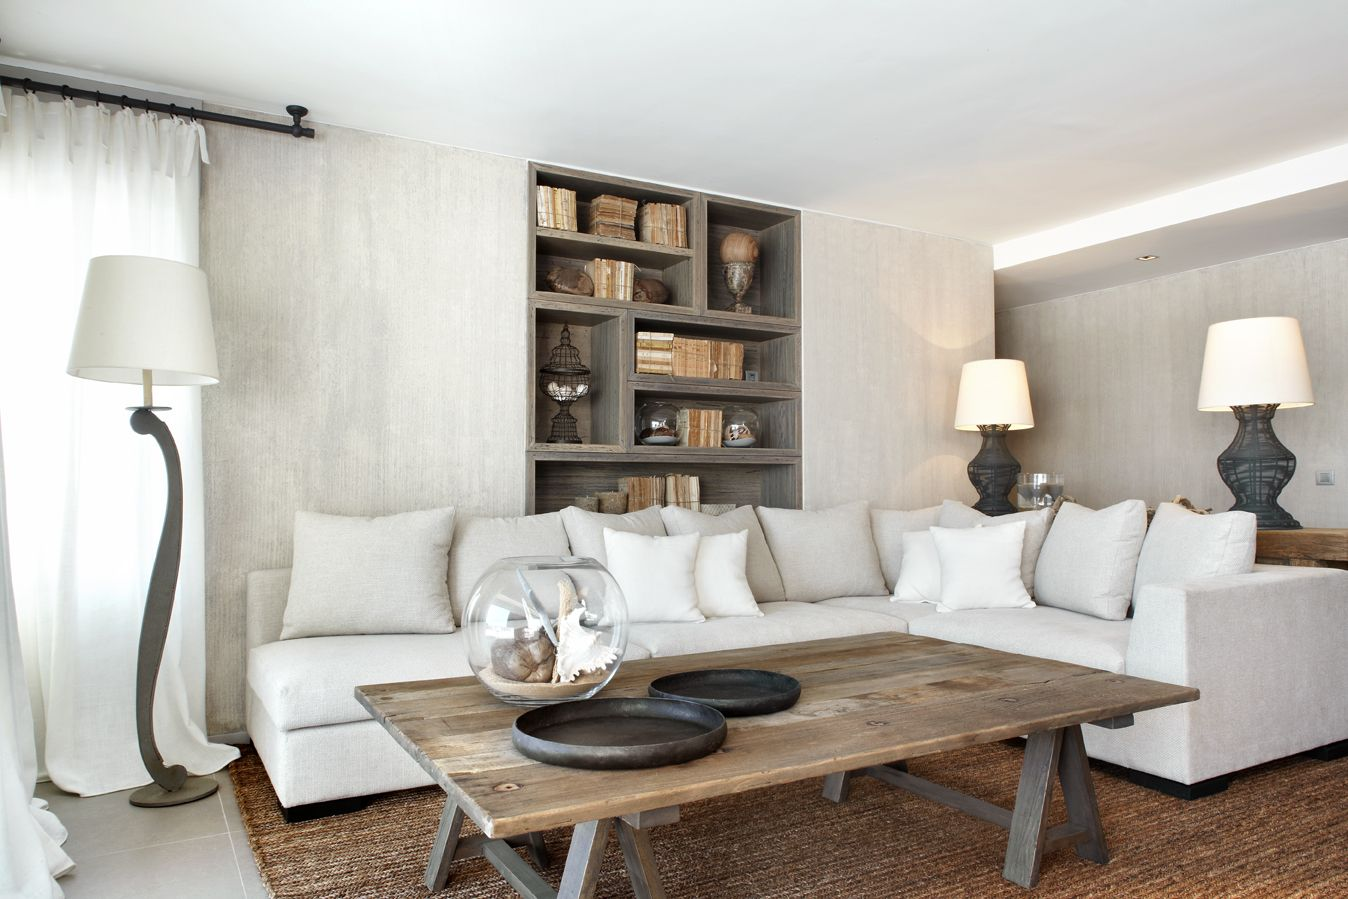 Molins Interiors // arquitectura interior - interiorismo - decoración - salón - sofá - blanco - librería - biblioteca - country - mesa de centro